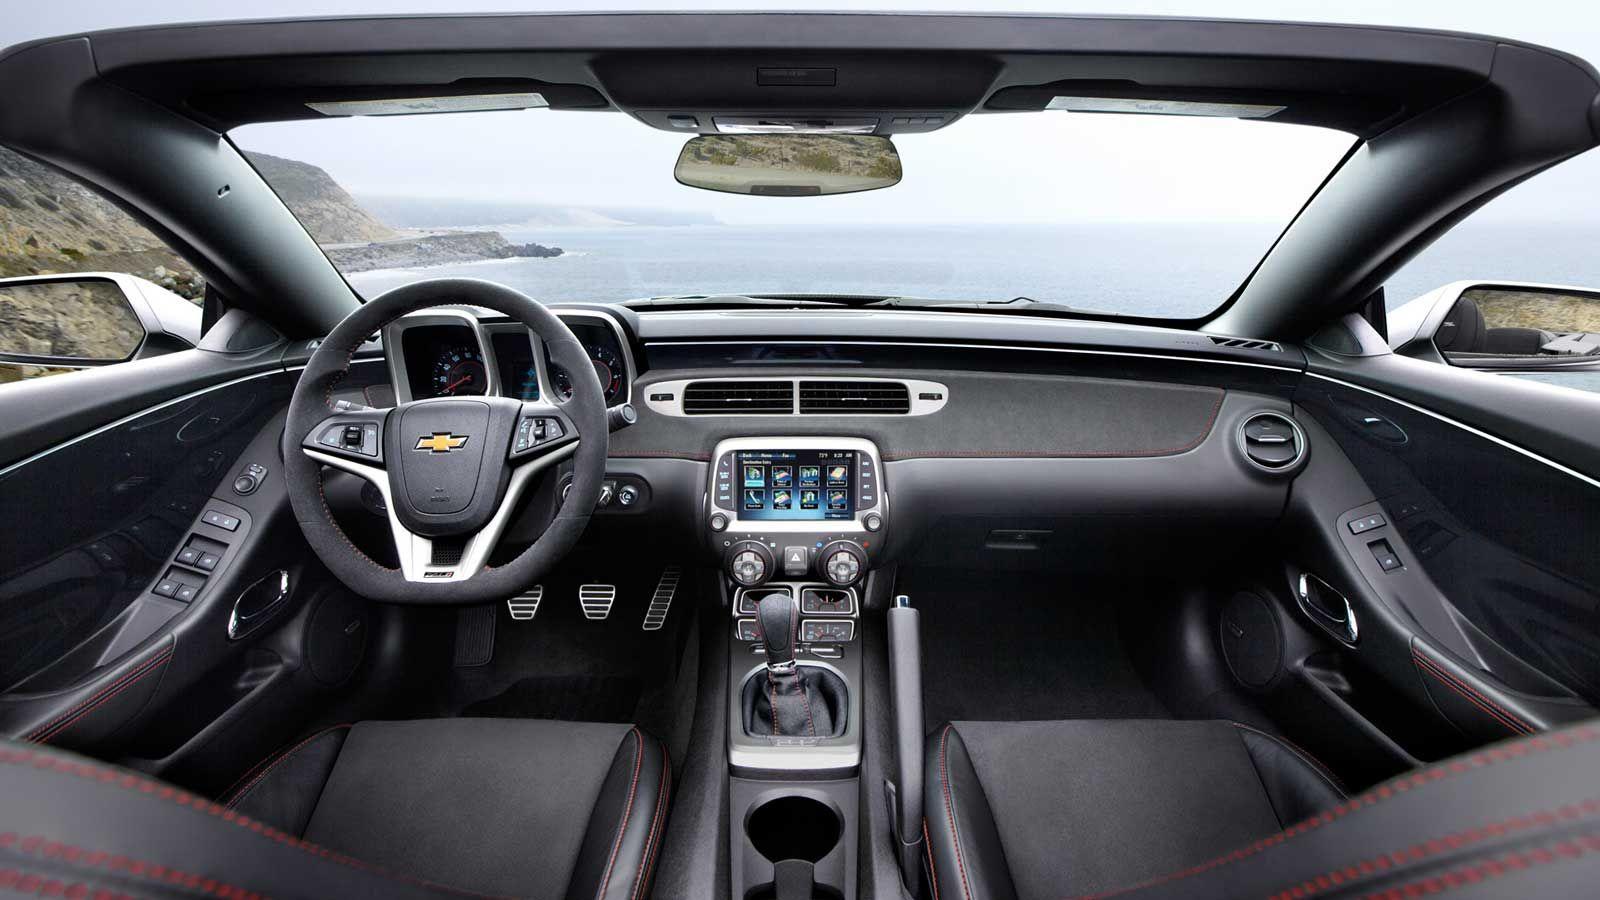 Chevrolet Camaro Interior 2013. Chevrolet Camaro Interior ...